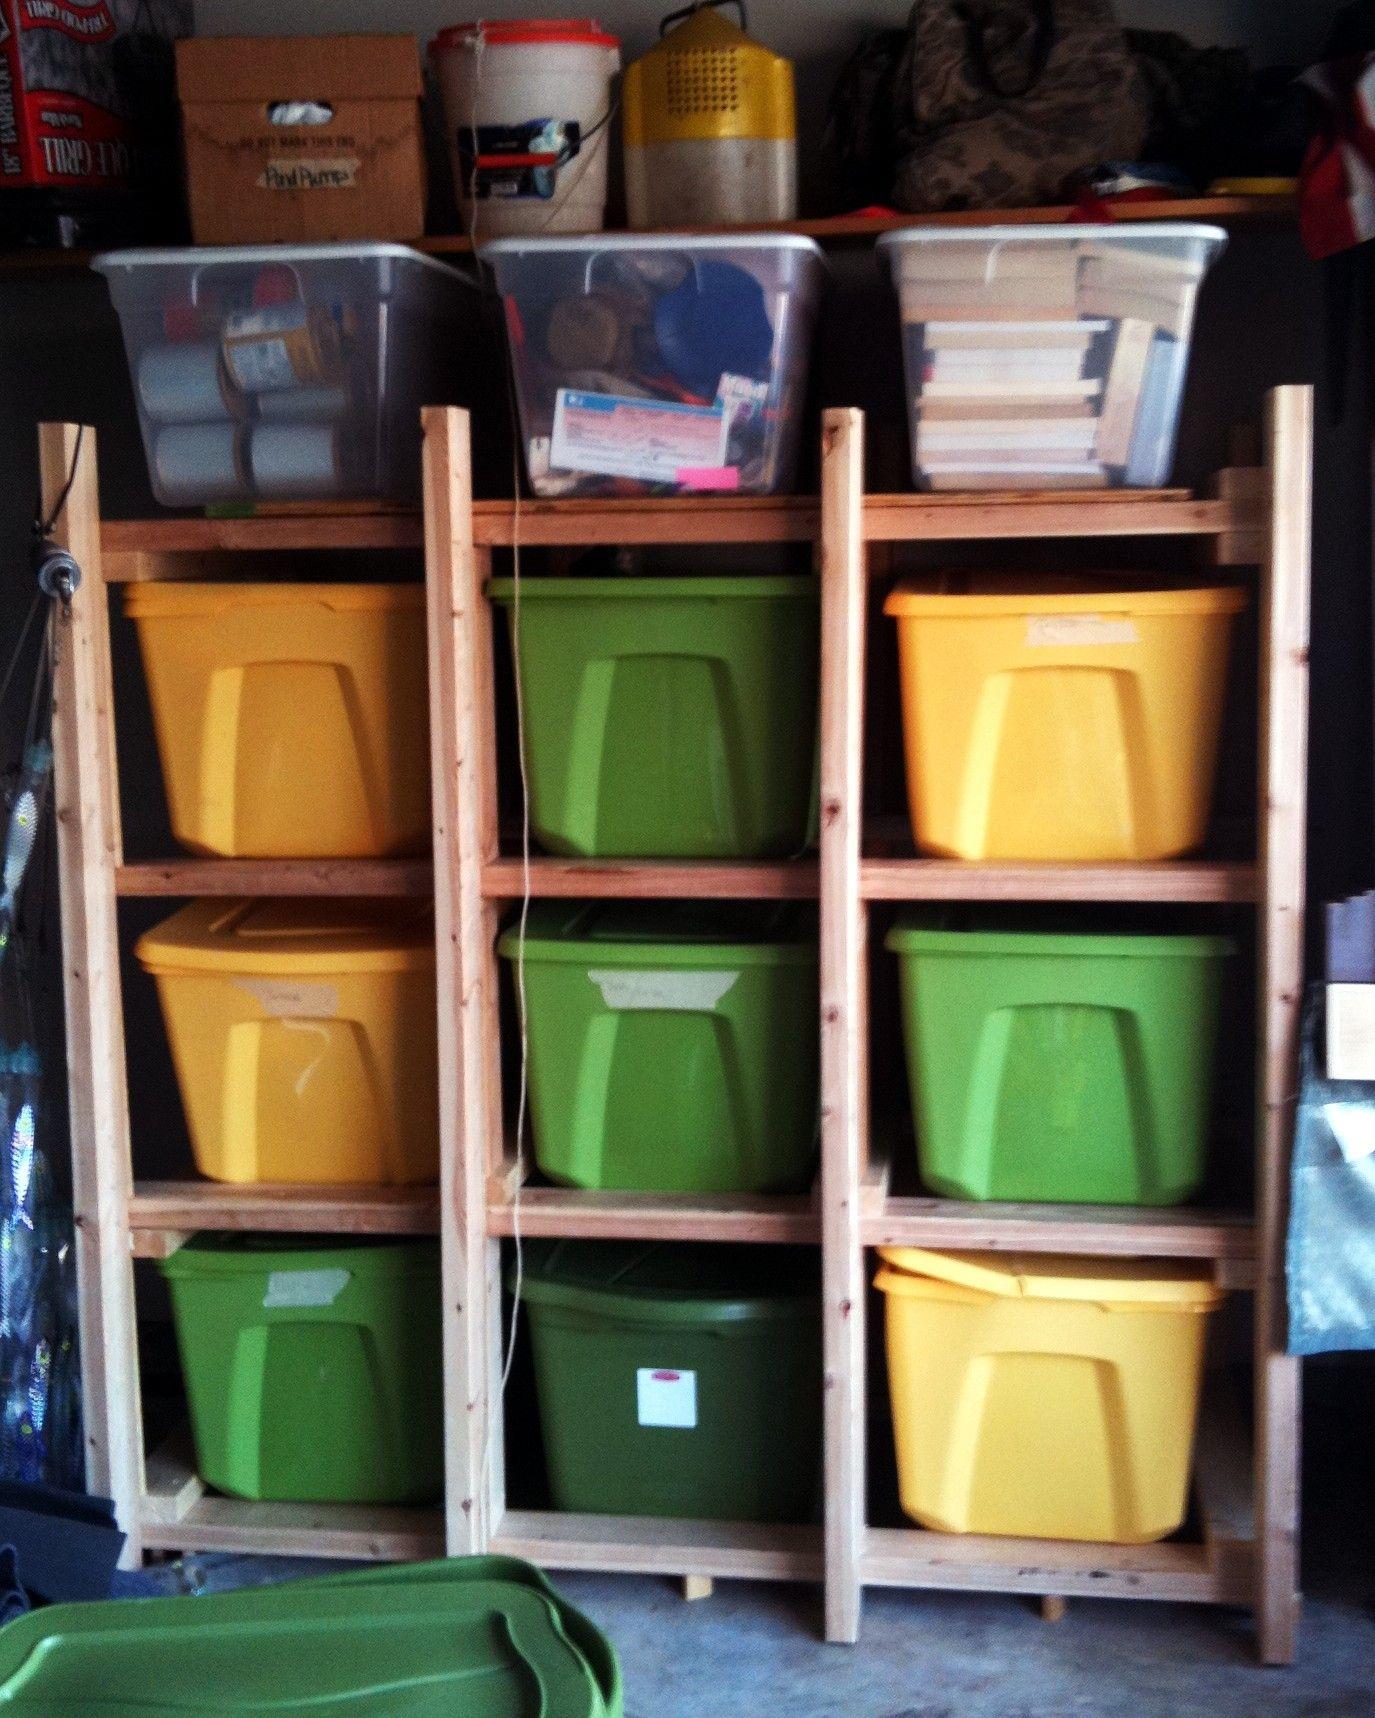 12 Storage Tote Shelving System 50.00 Tote storage, Diy